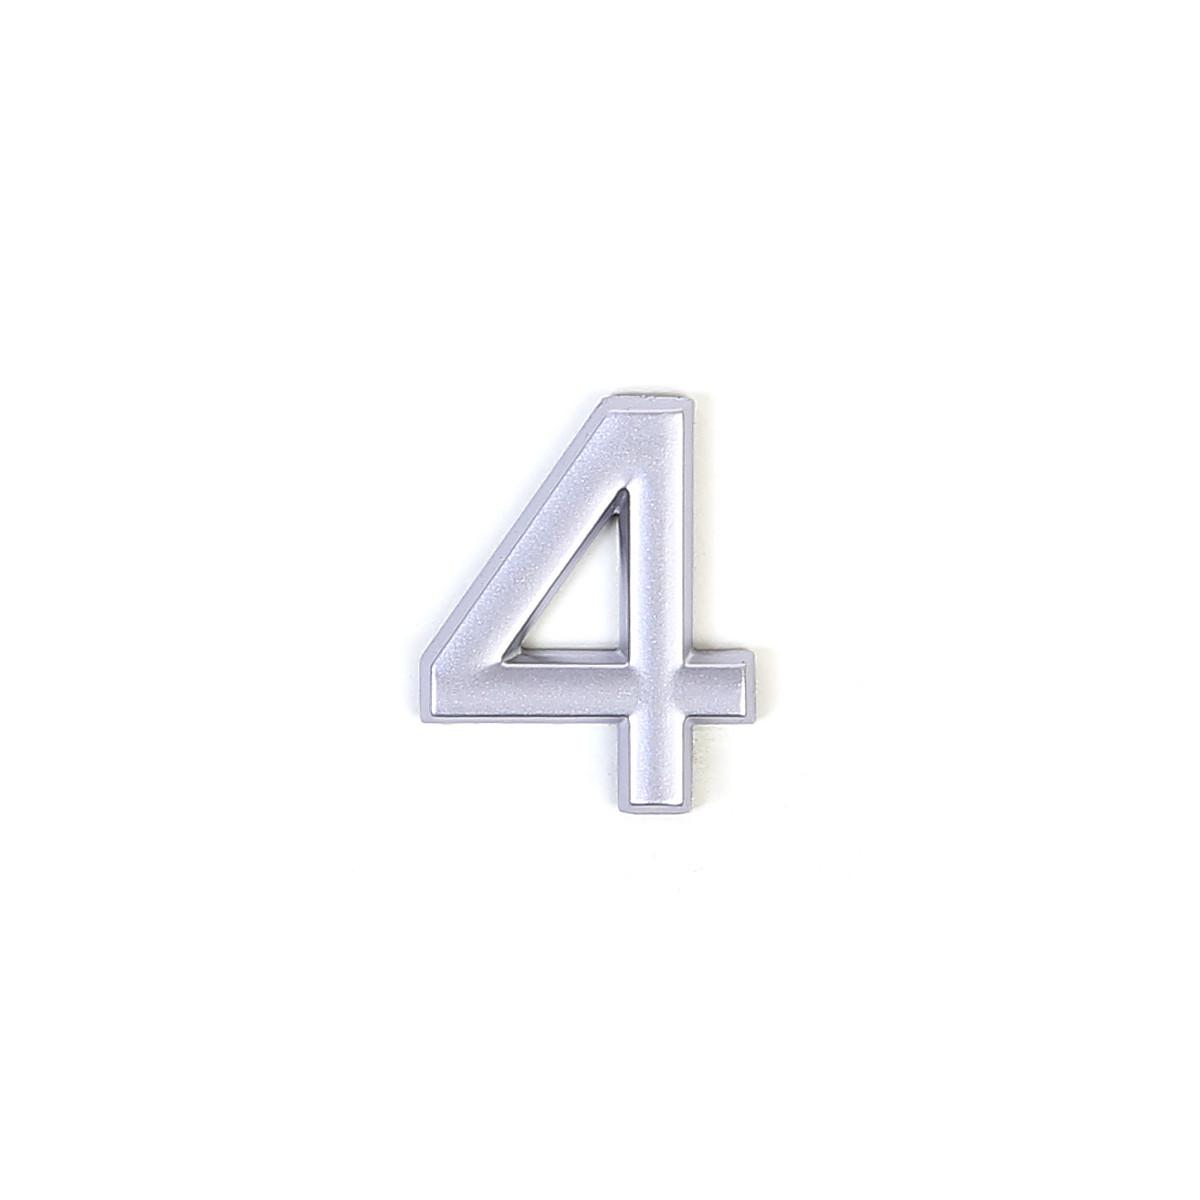 Номер на дверь Larvij цифра 4 матовое серебро. Номер из пластика (LNP4MS#4)